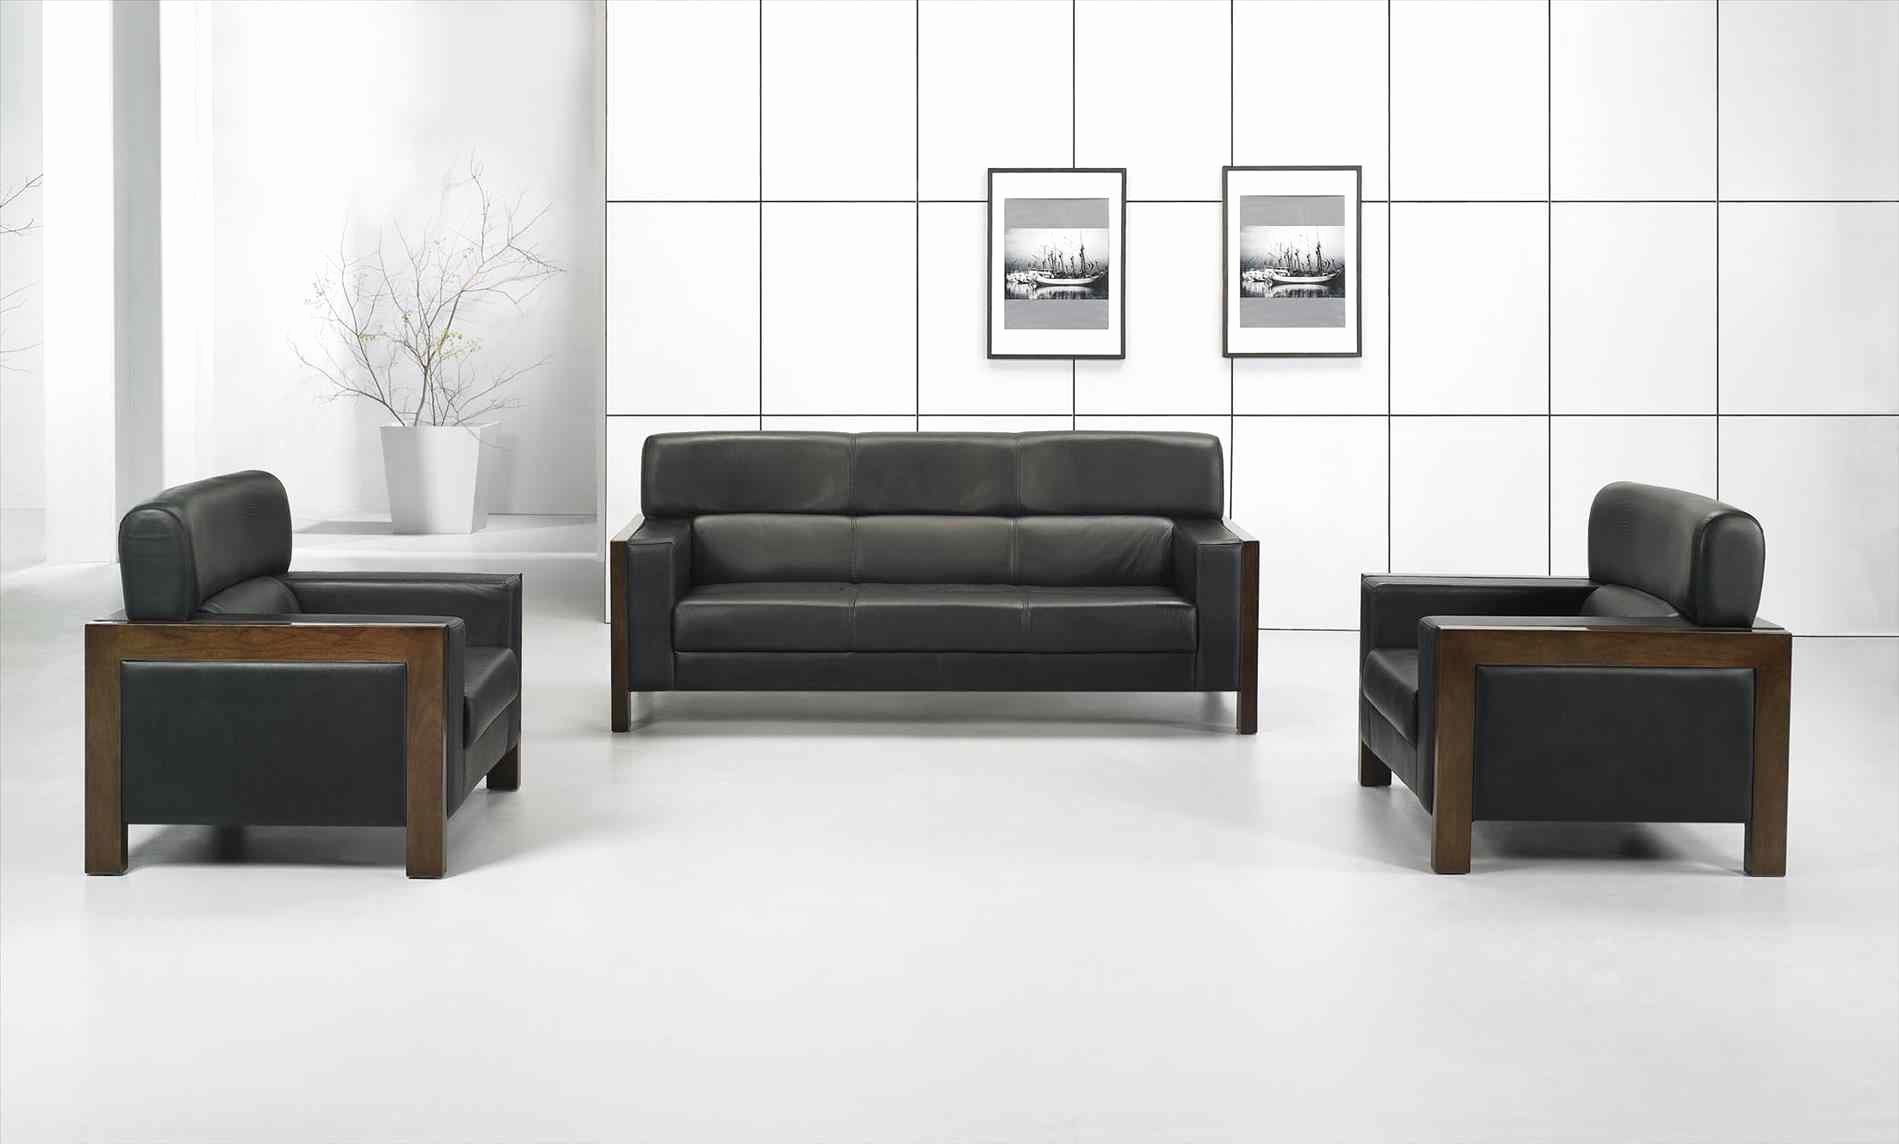 Pin On Office Furniture Design Sofa Inspiration